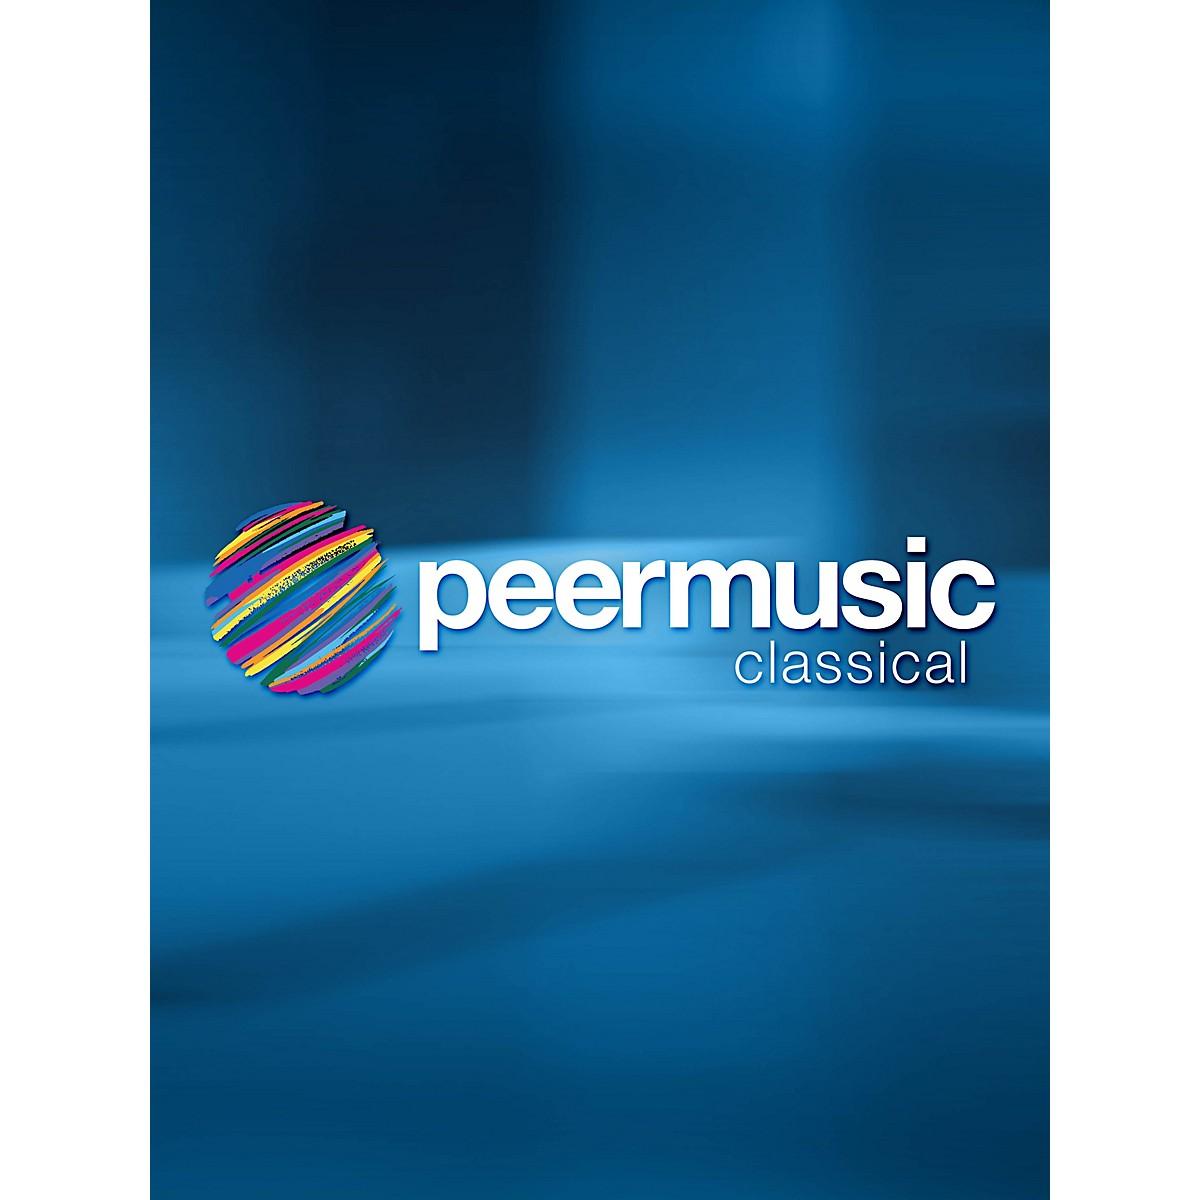 Peer Music Sonatina (for Solo Guitar) Peermusic Classical Series